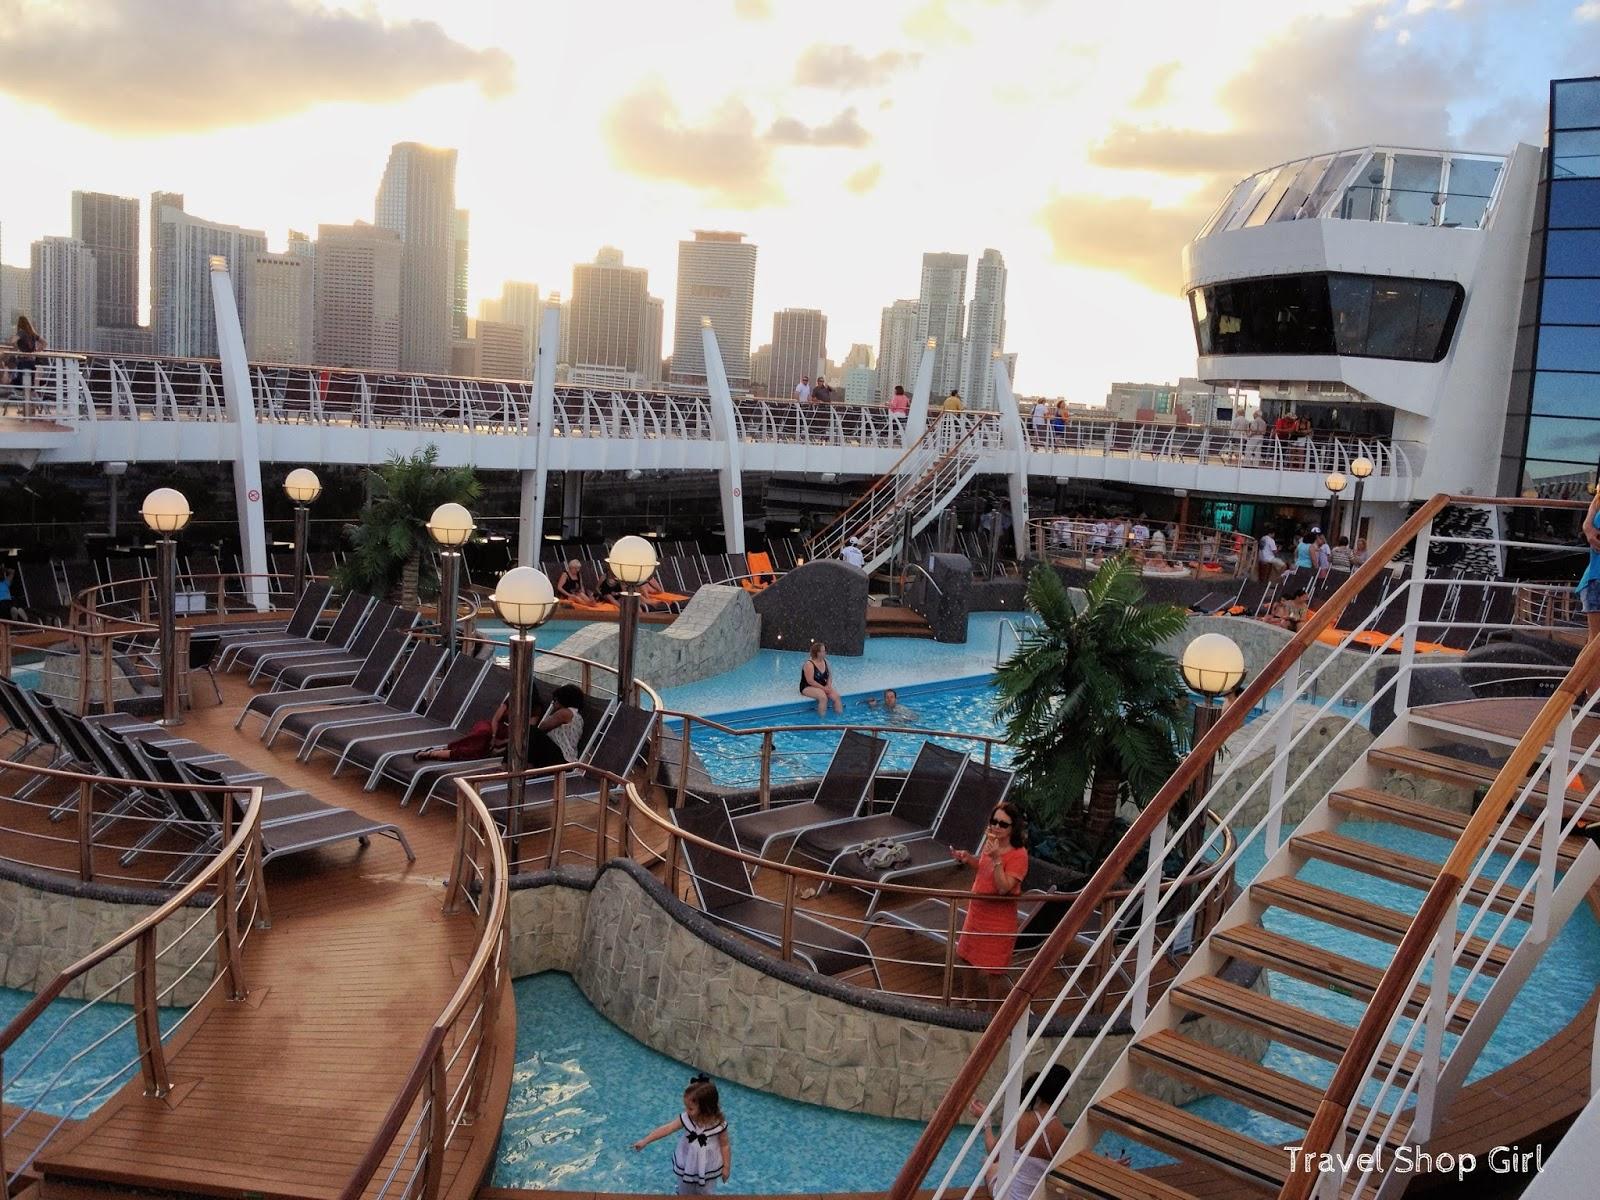 MSC Divina Pools Sun amp Fun MSC Cruises Review Travel  : 609574B6 828F 42FD 9373 26827116454Czpsjhrvcgsi1 from travelshopgirl.com size 1600 x 1200 jpeg 519kB